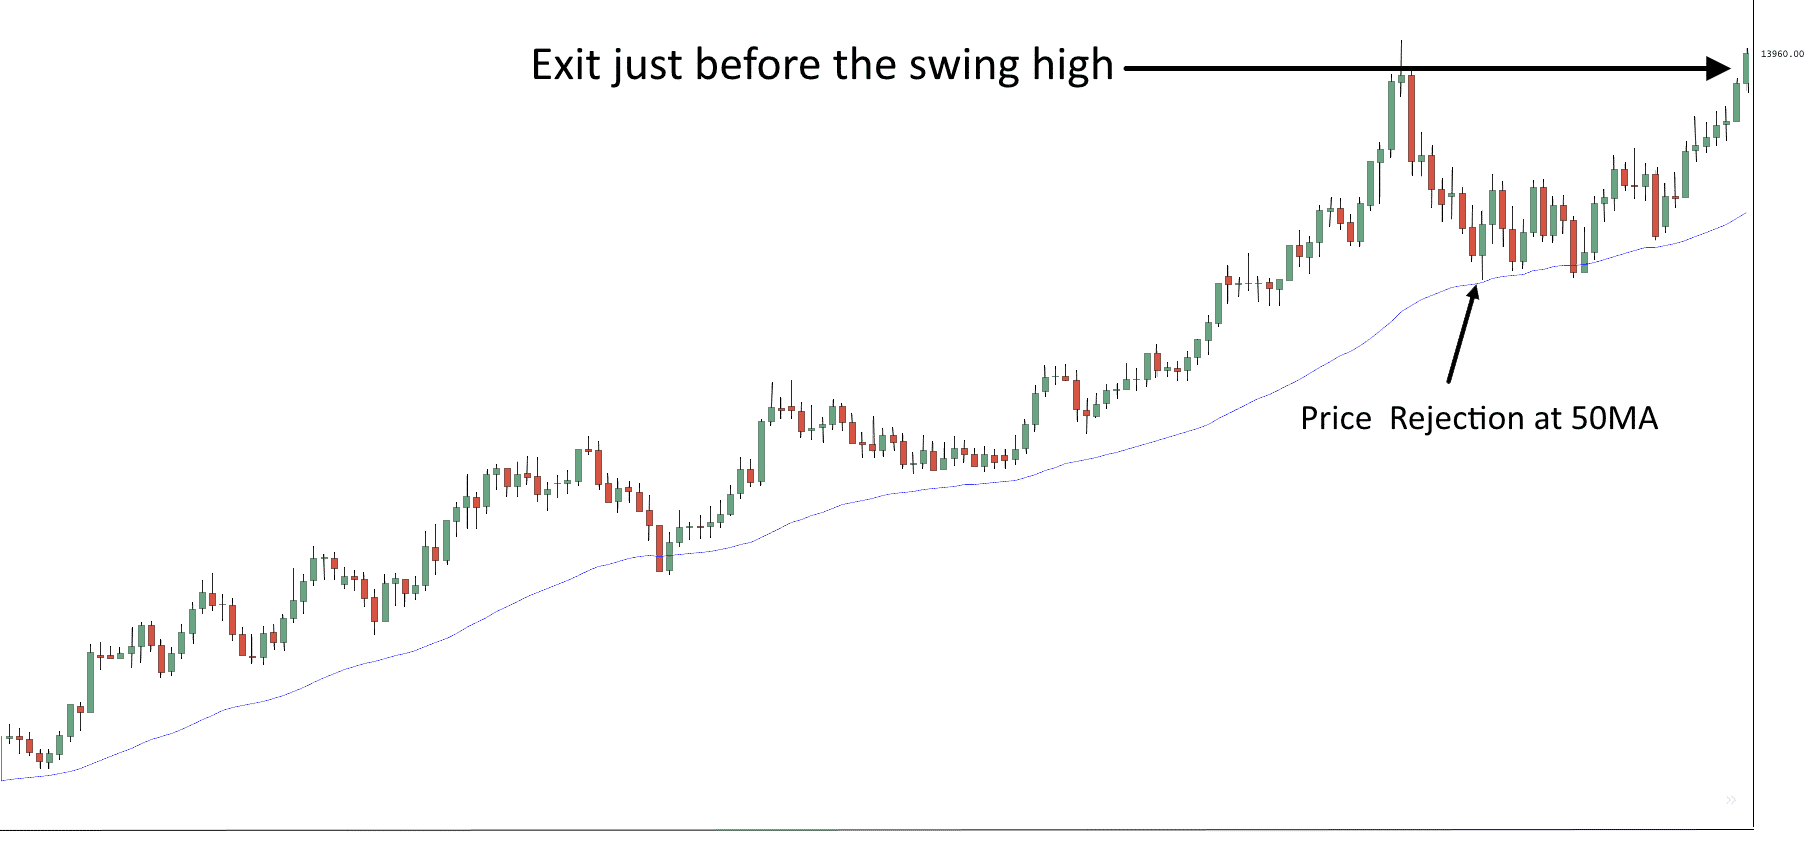 Swing Trading Chart Sample 2 - Finance Brokerage